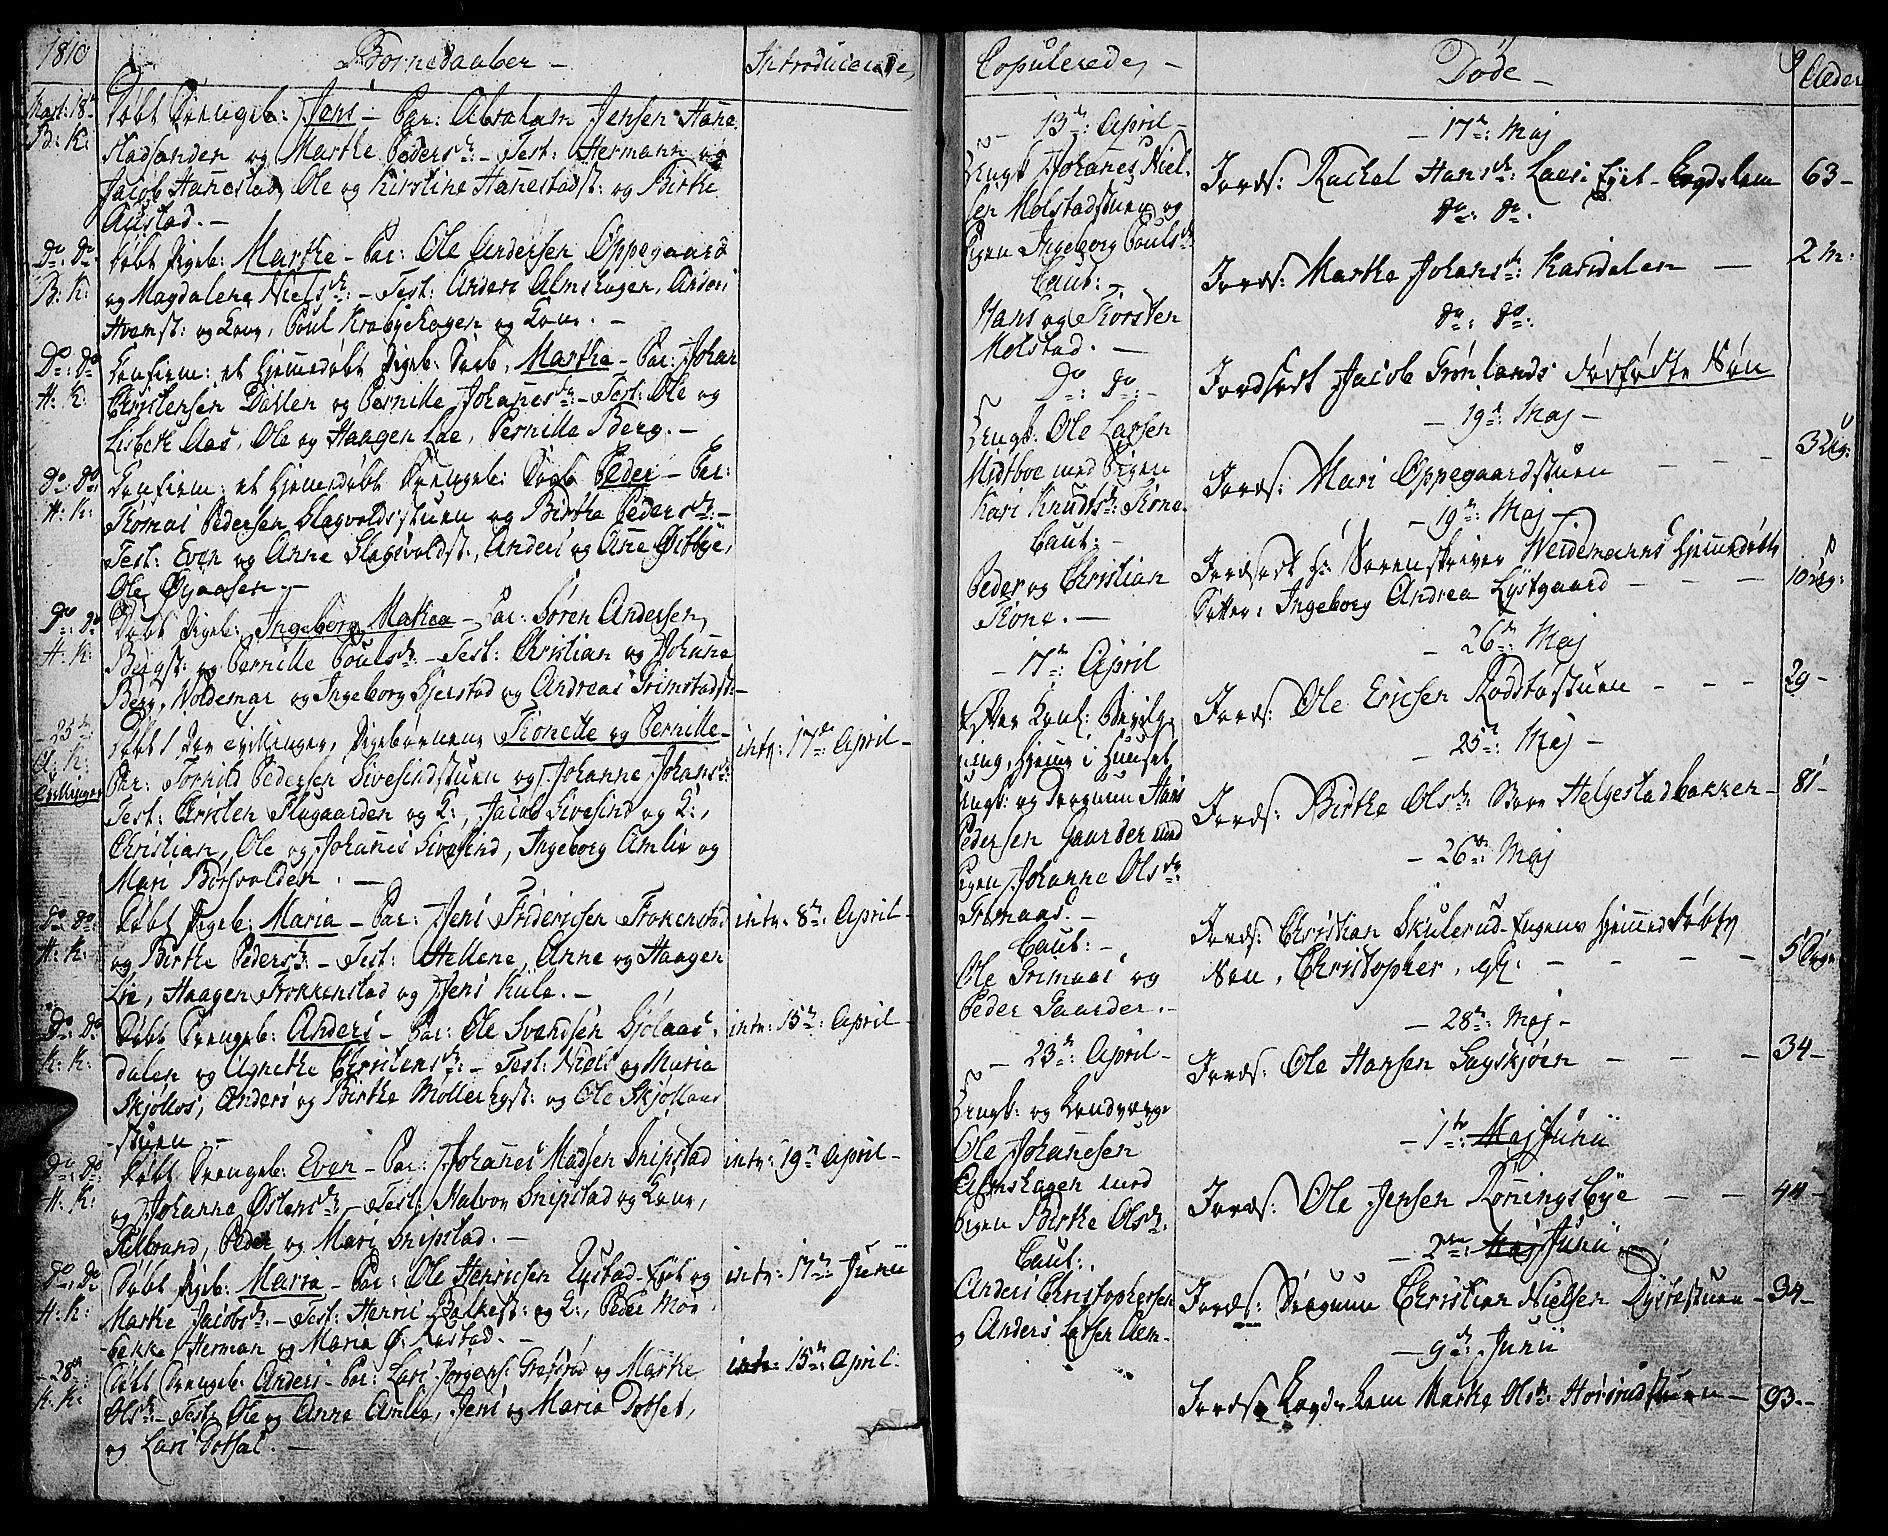 SAH, Toten prestekontor, Ministerialbok nr. 8, 1809-1814, s. 9